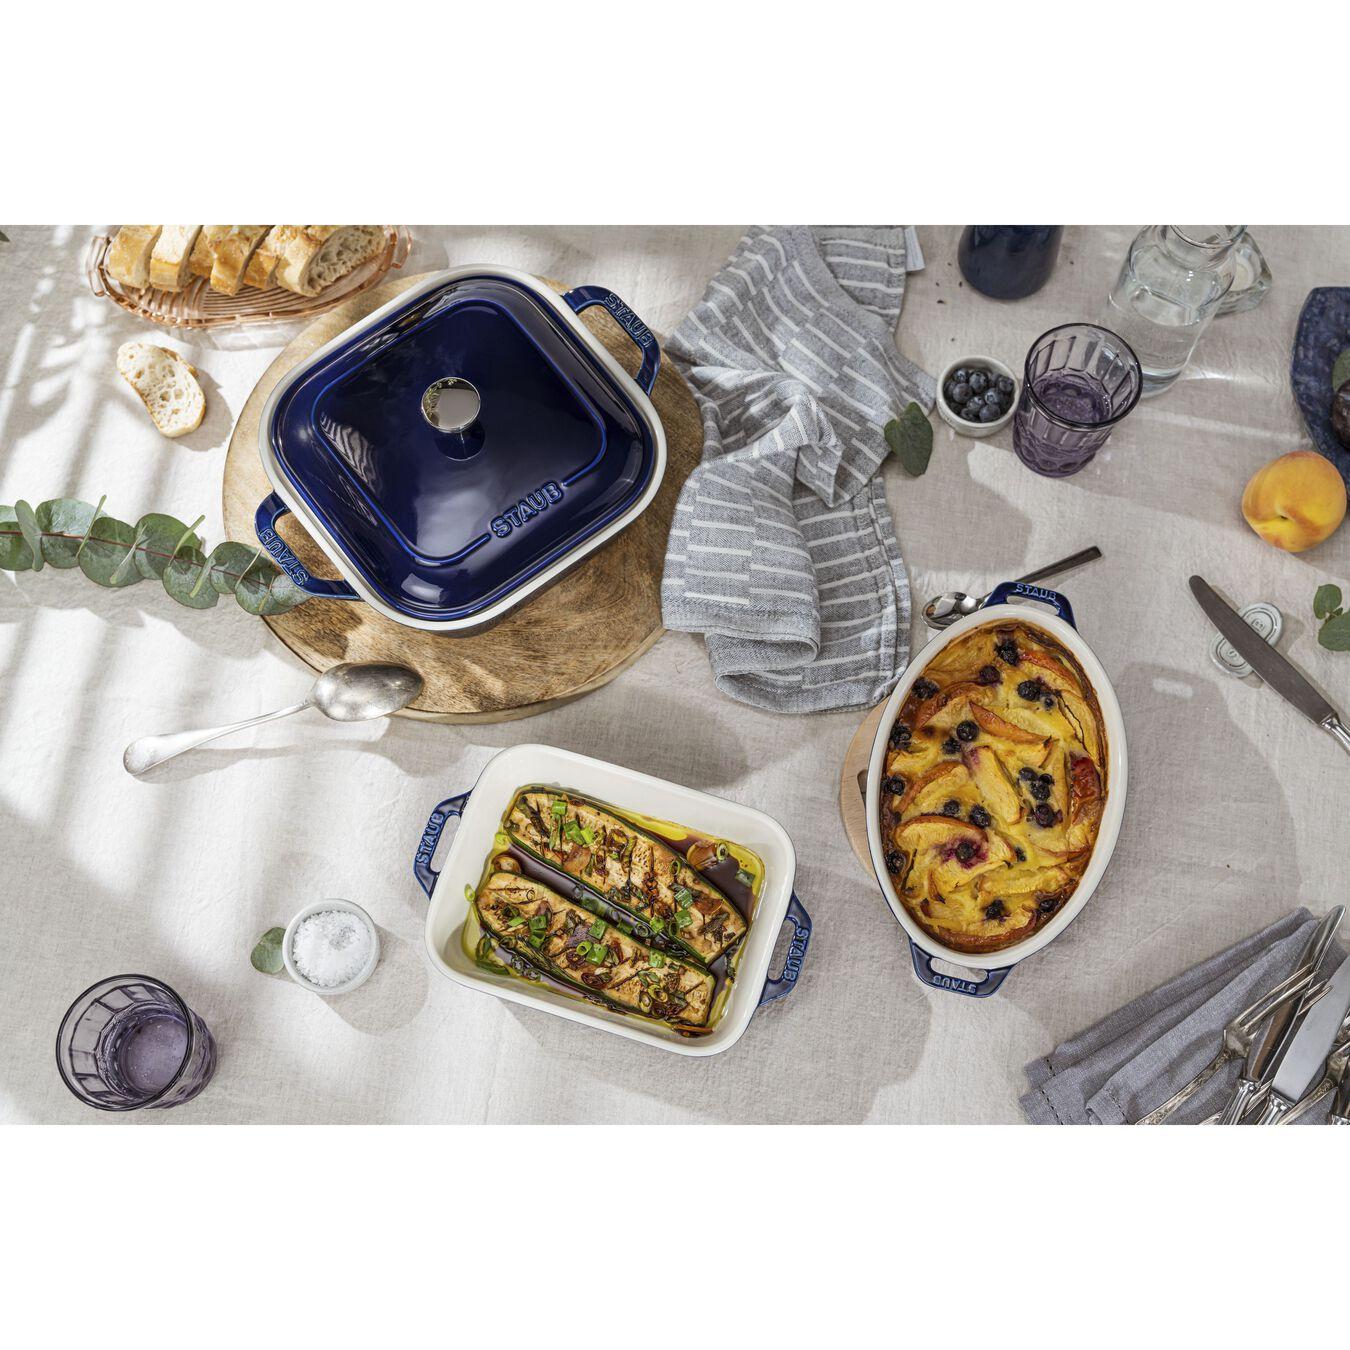 Ovenware set, 4 Piece | dark-blue,,large 9